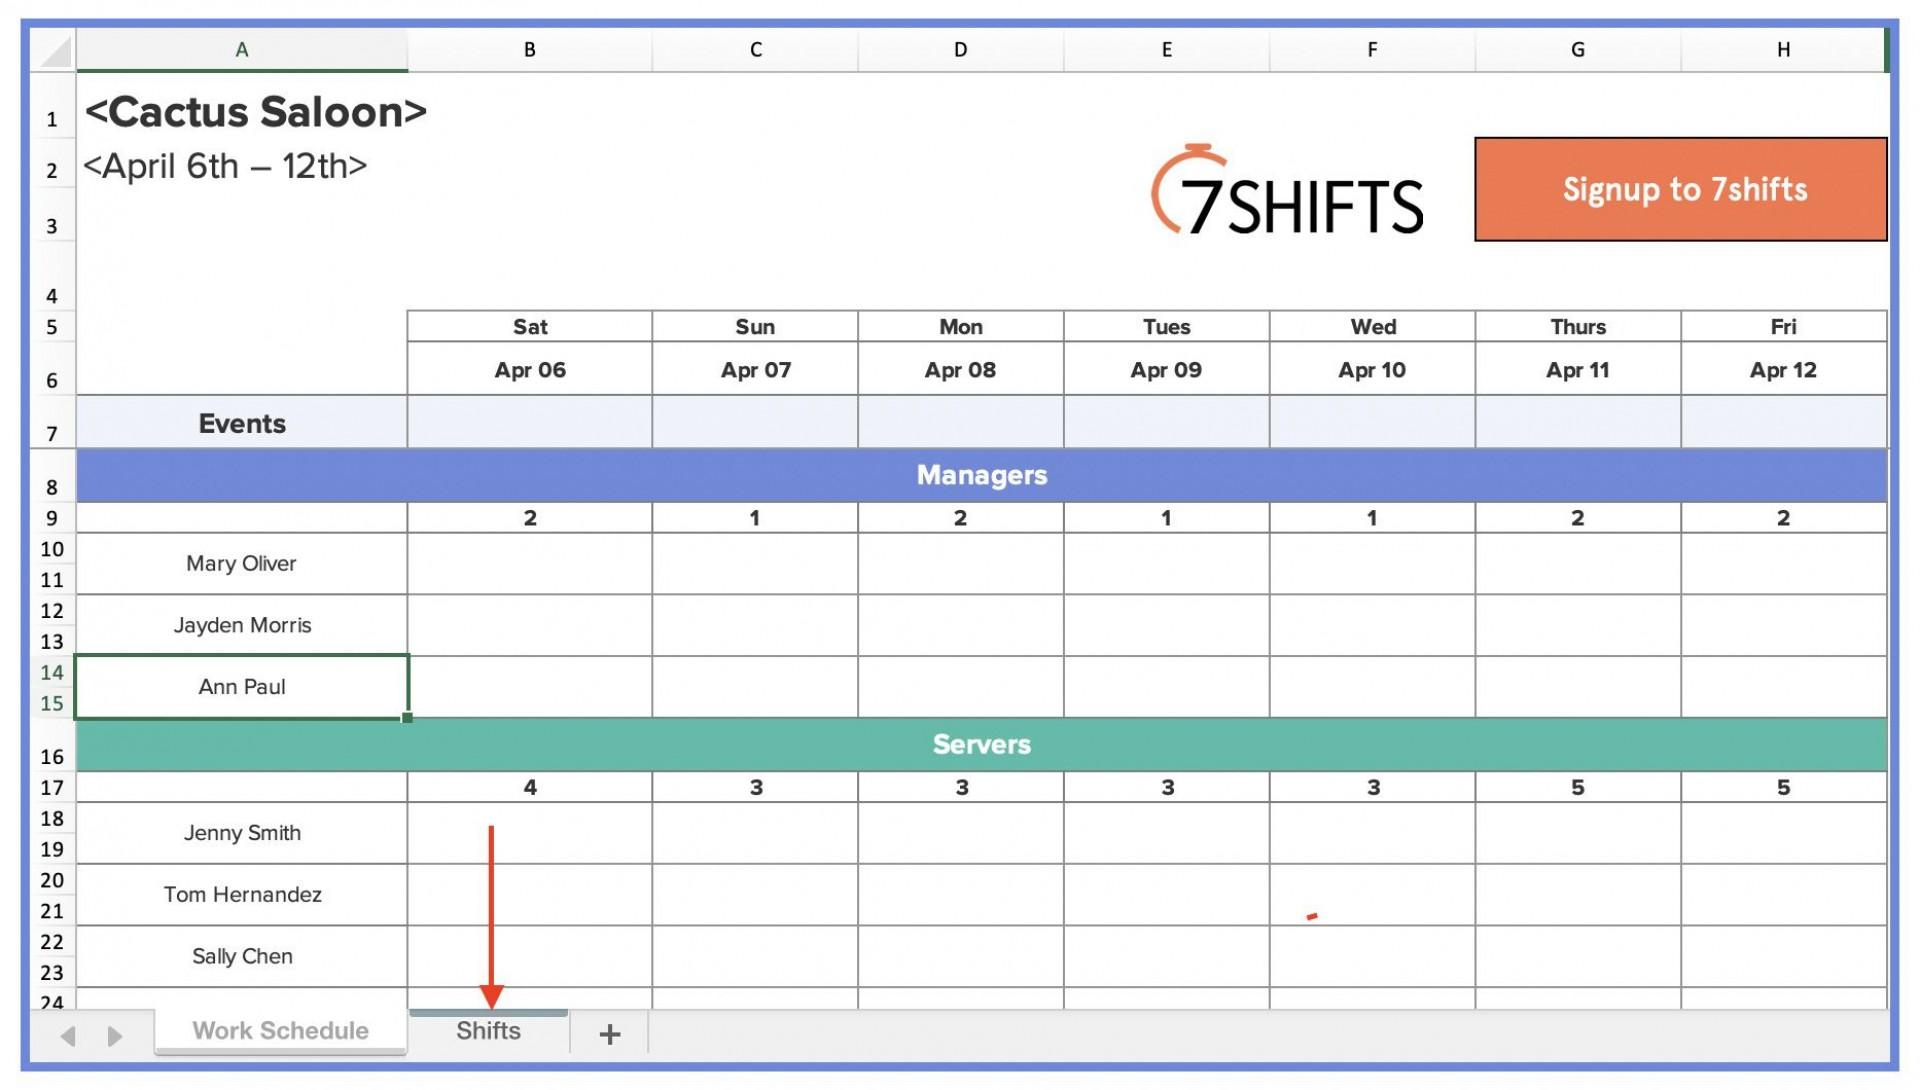 004 Striking Employee Shift Scheduling Template Photo  Schedule Google Sheet Work Plan Word Weekly Excel Free1920